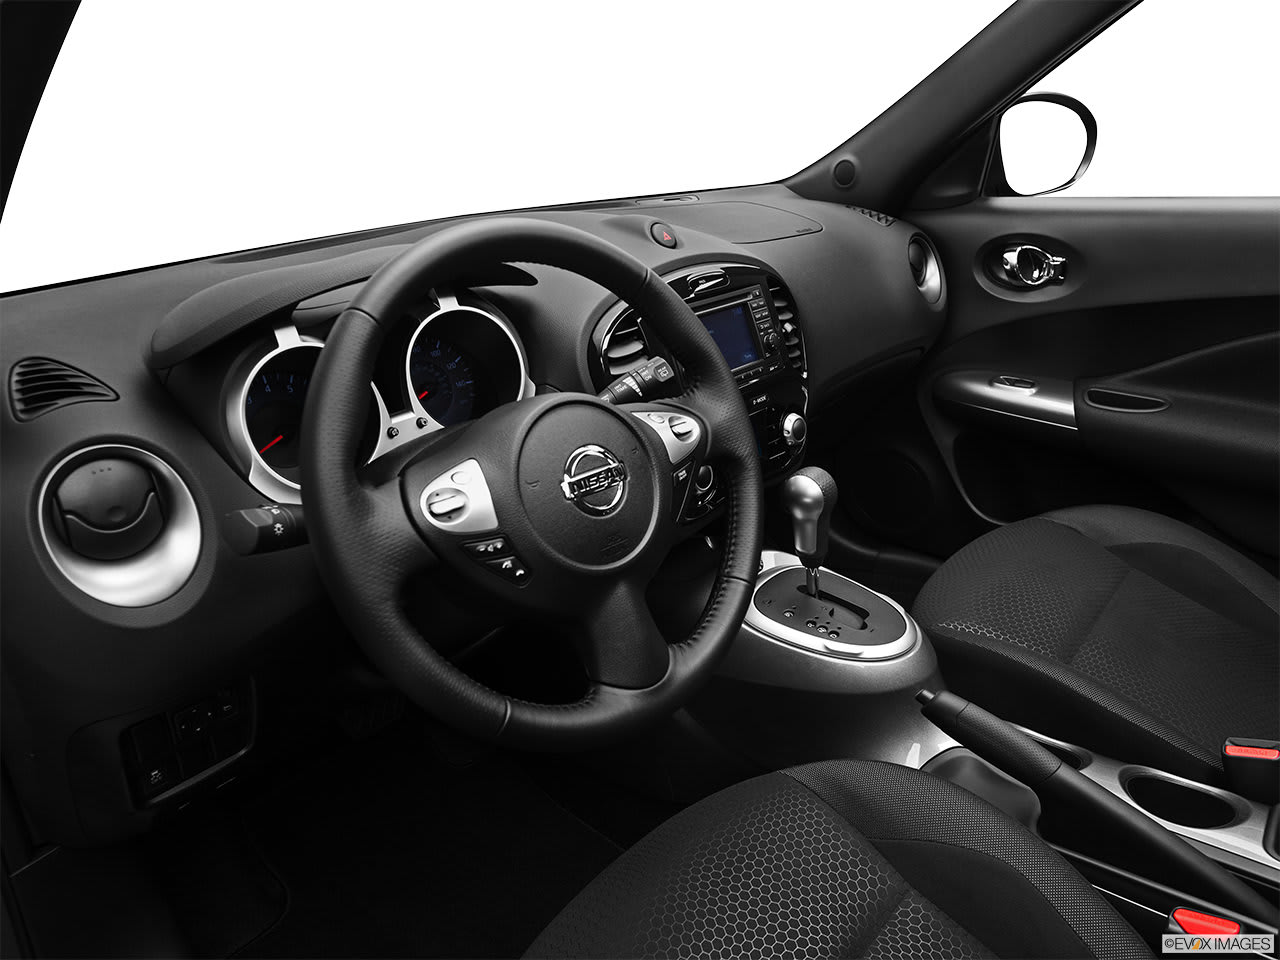 Nissan Juke 2012 Interior